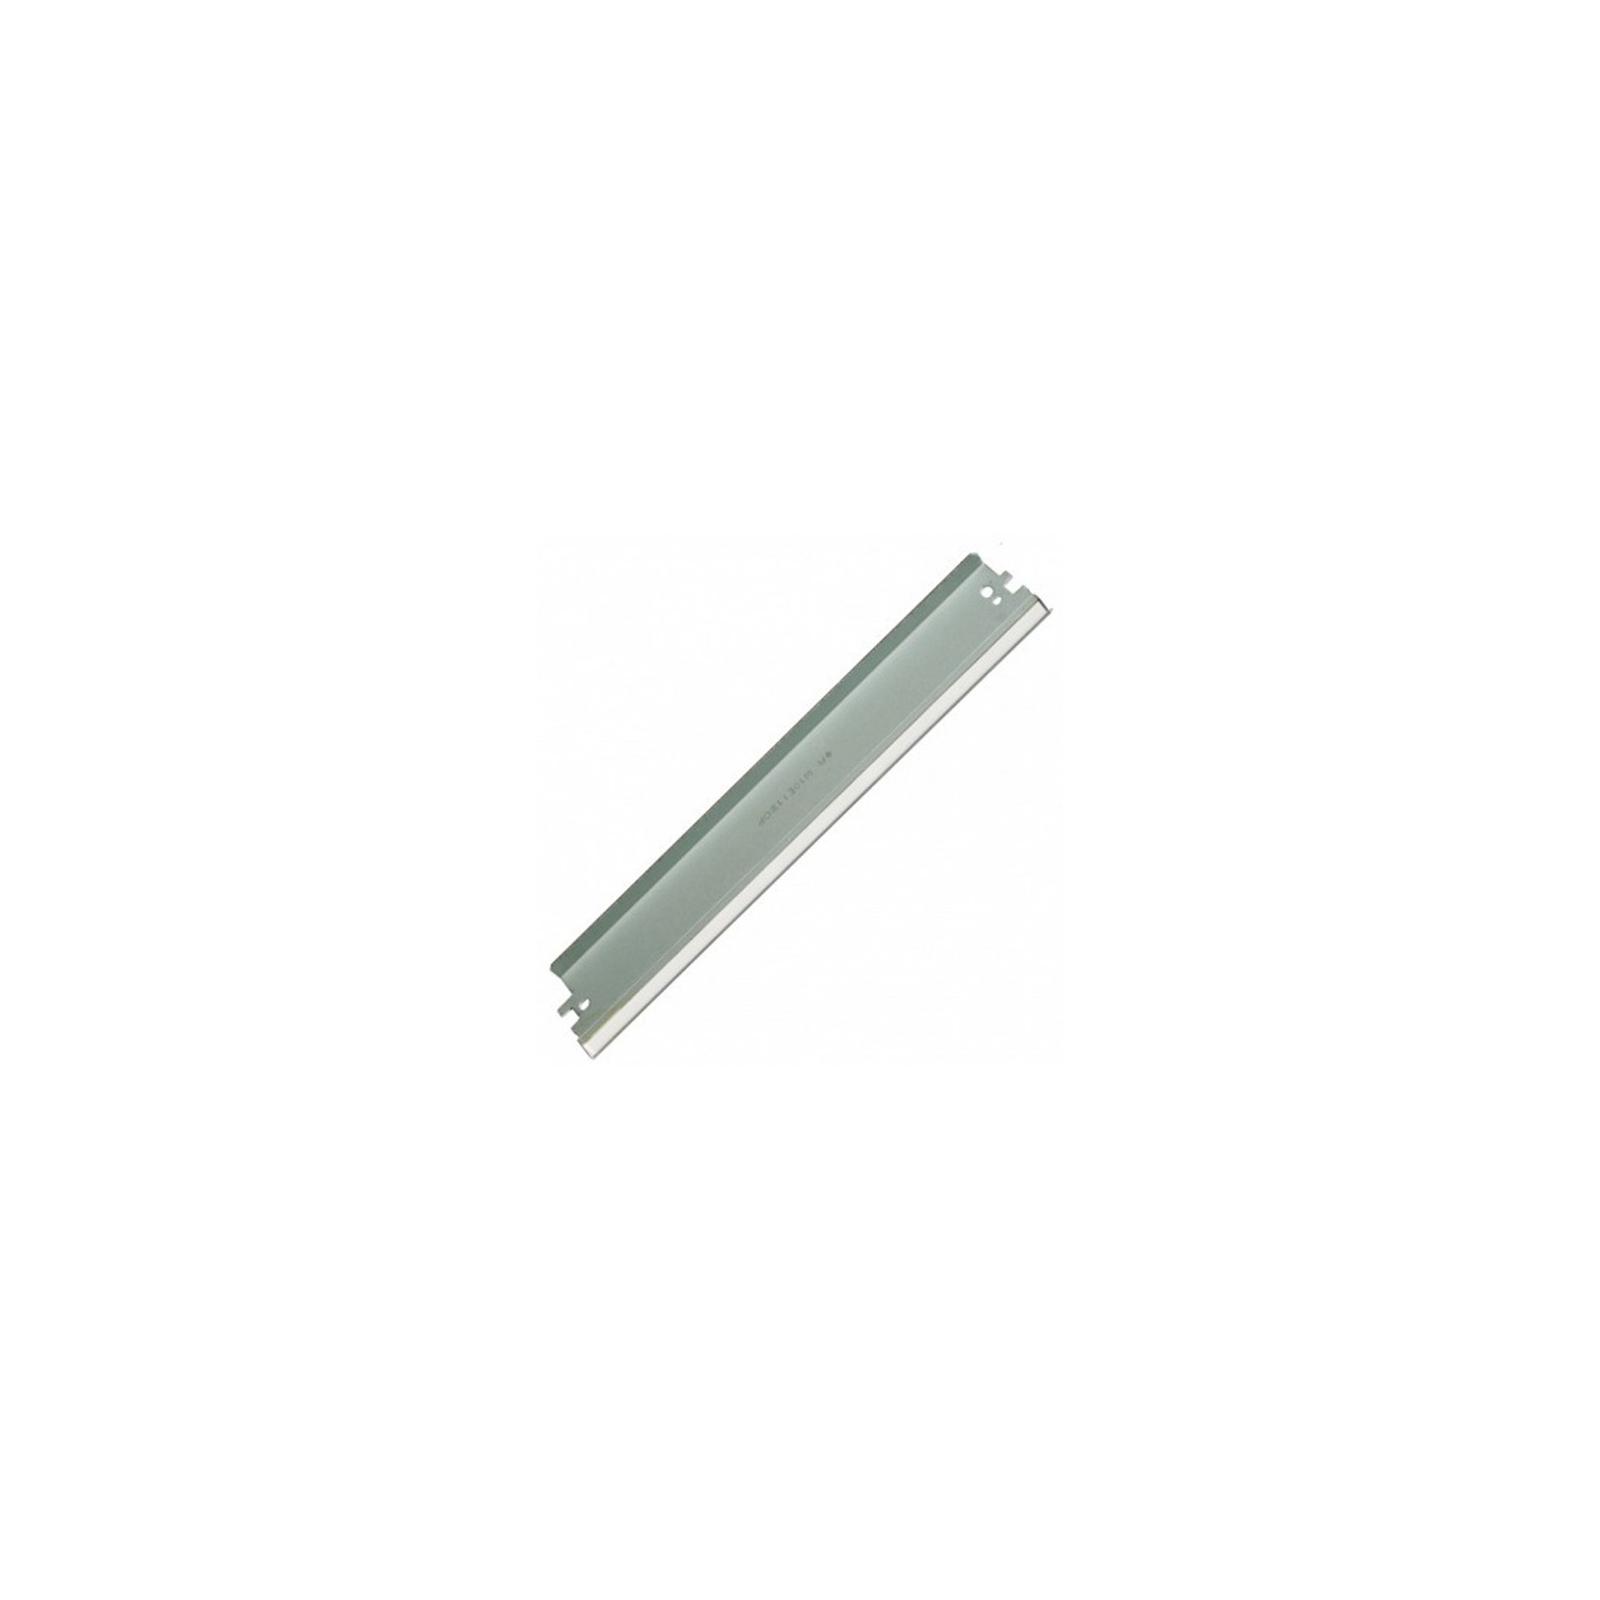 Чистящее лезвие HP LJ 2100/2300/2410/2420/2430 Static Control (HP23BLADE)